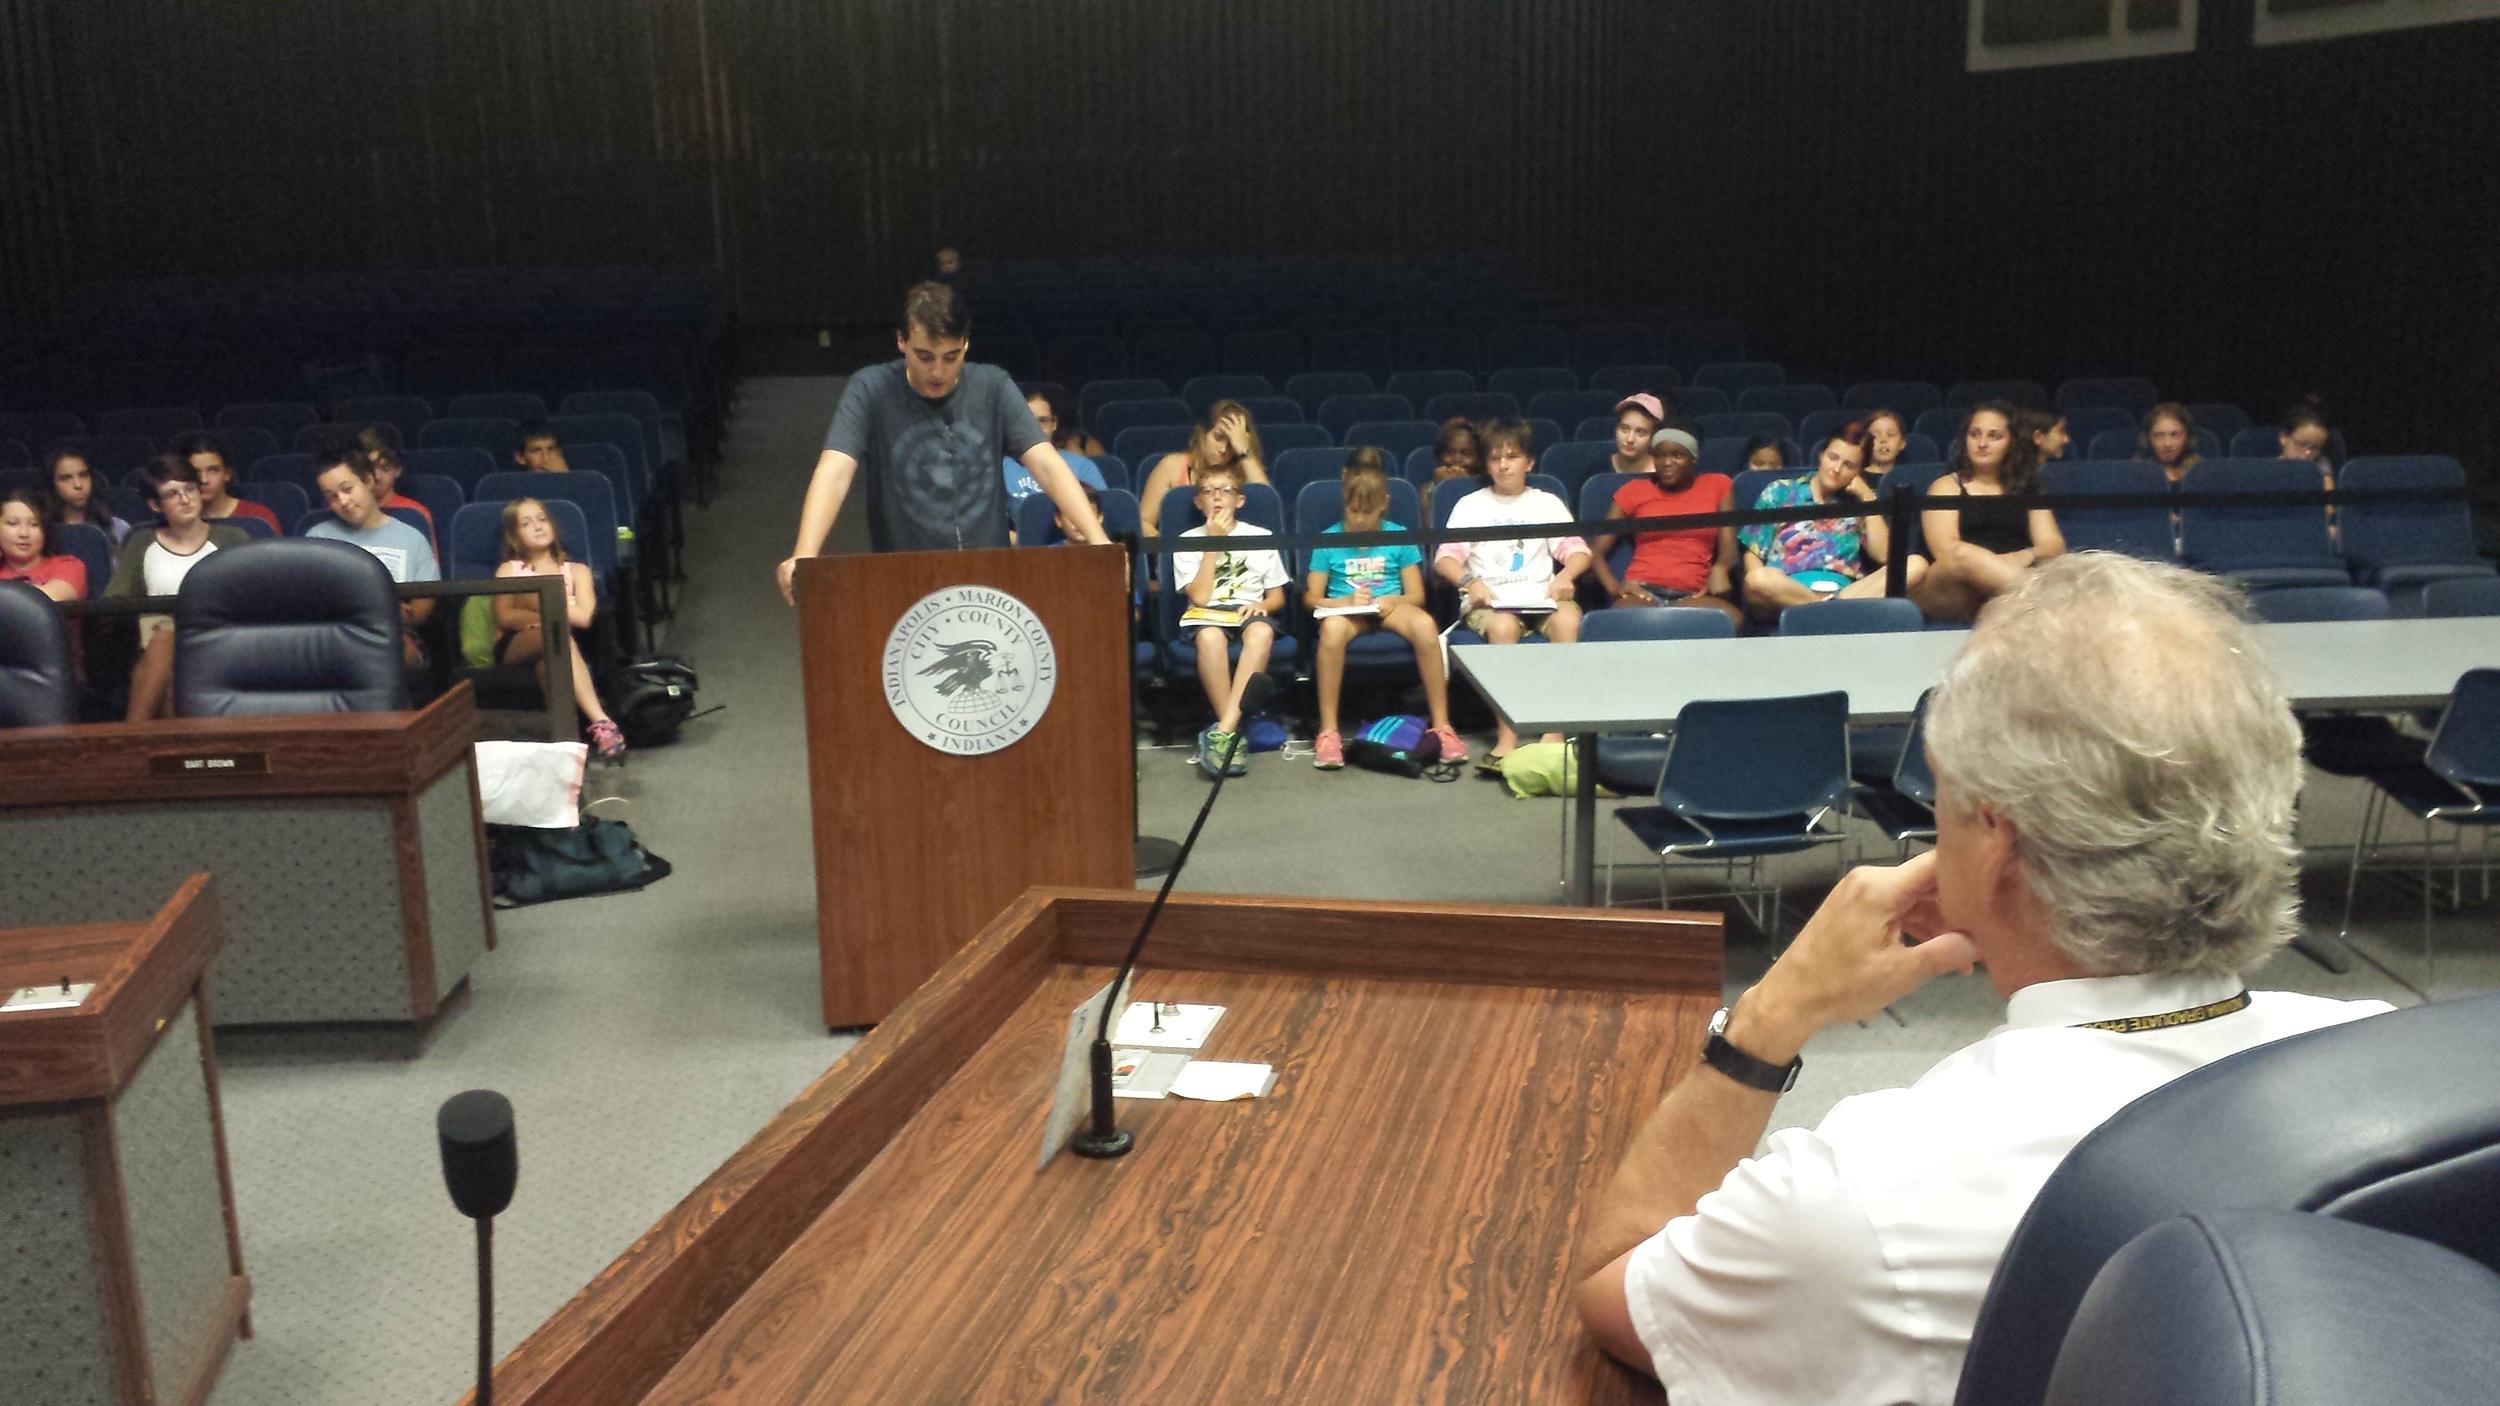 Ben, 15, from International School of Indiana, testifies to, in the foreground, Judge David Dreyer.